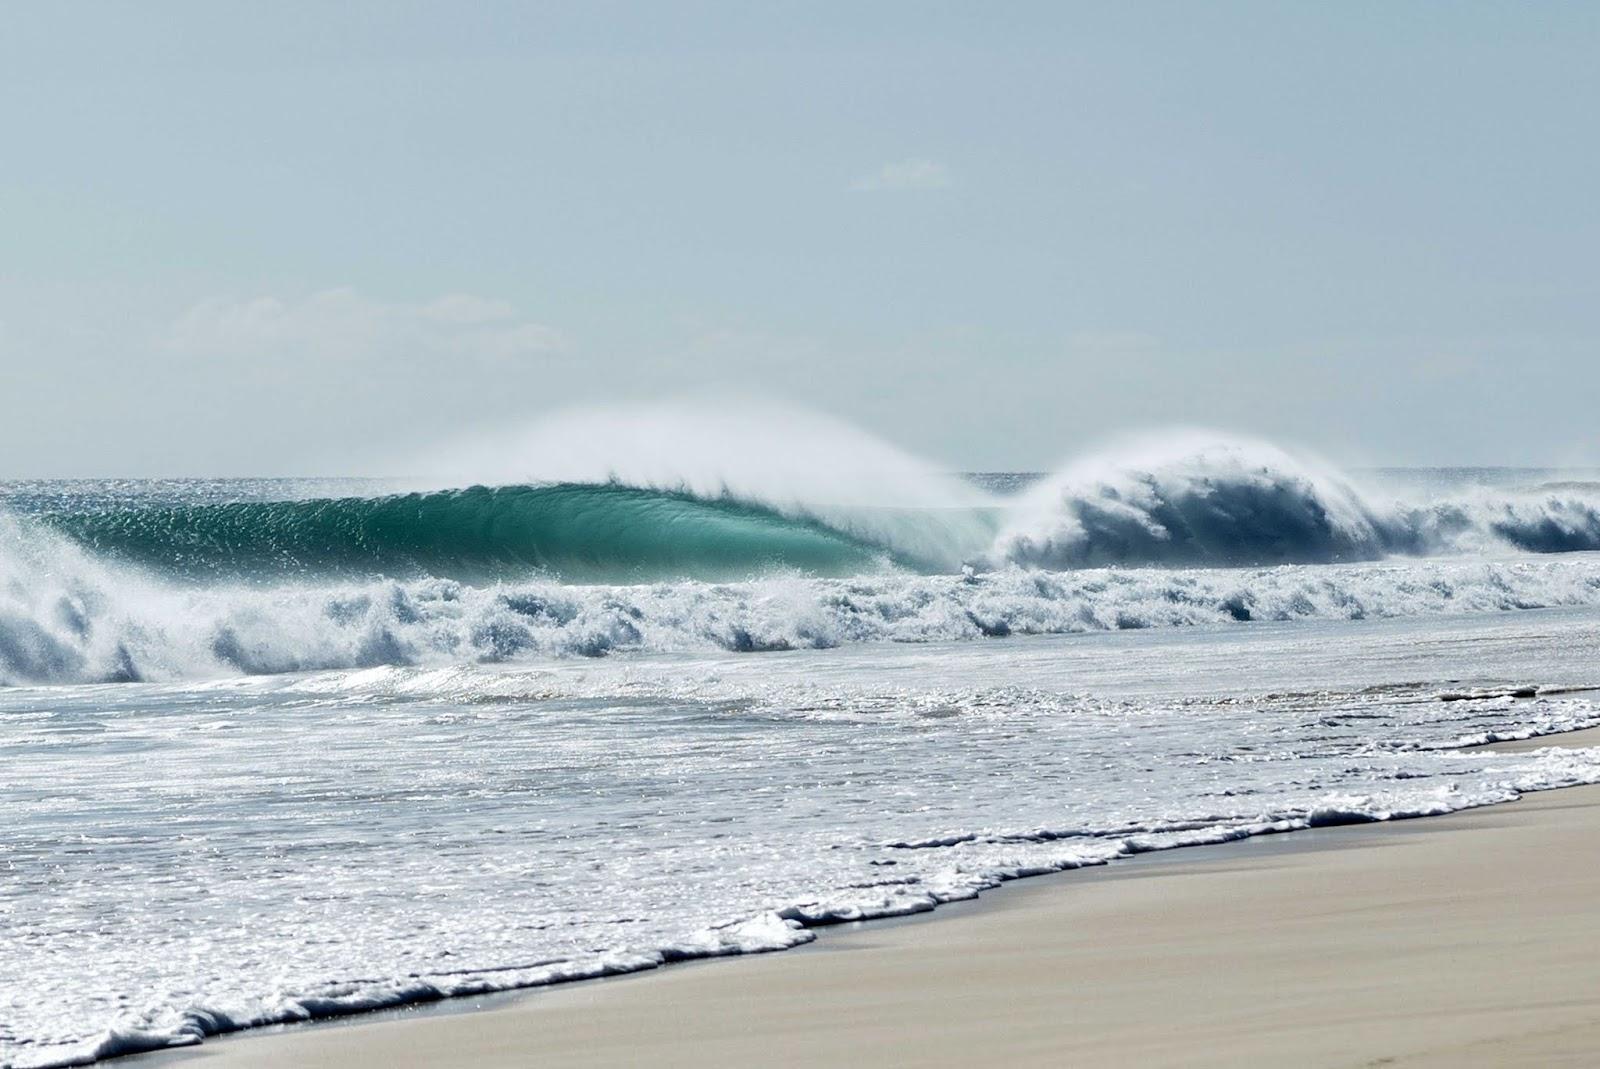 natxo gonzalez surfer 01